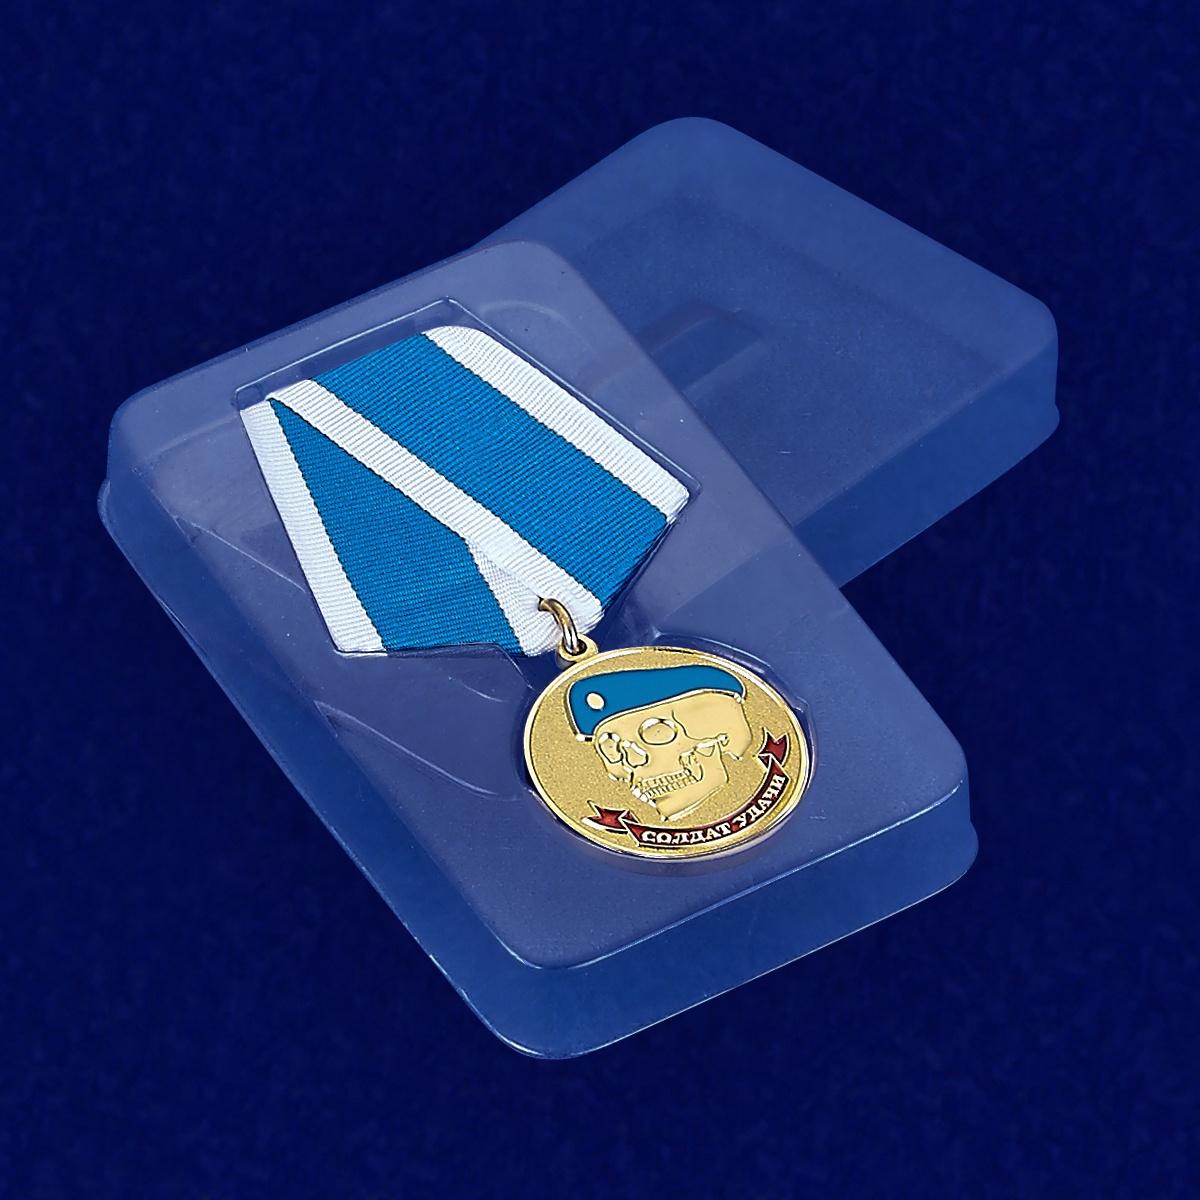 Пластиковый футляр к медали ВДВ Солдат удачи